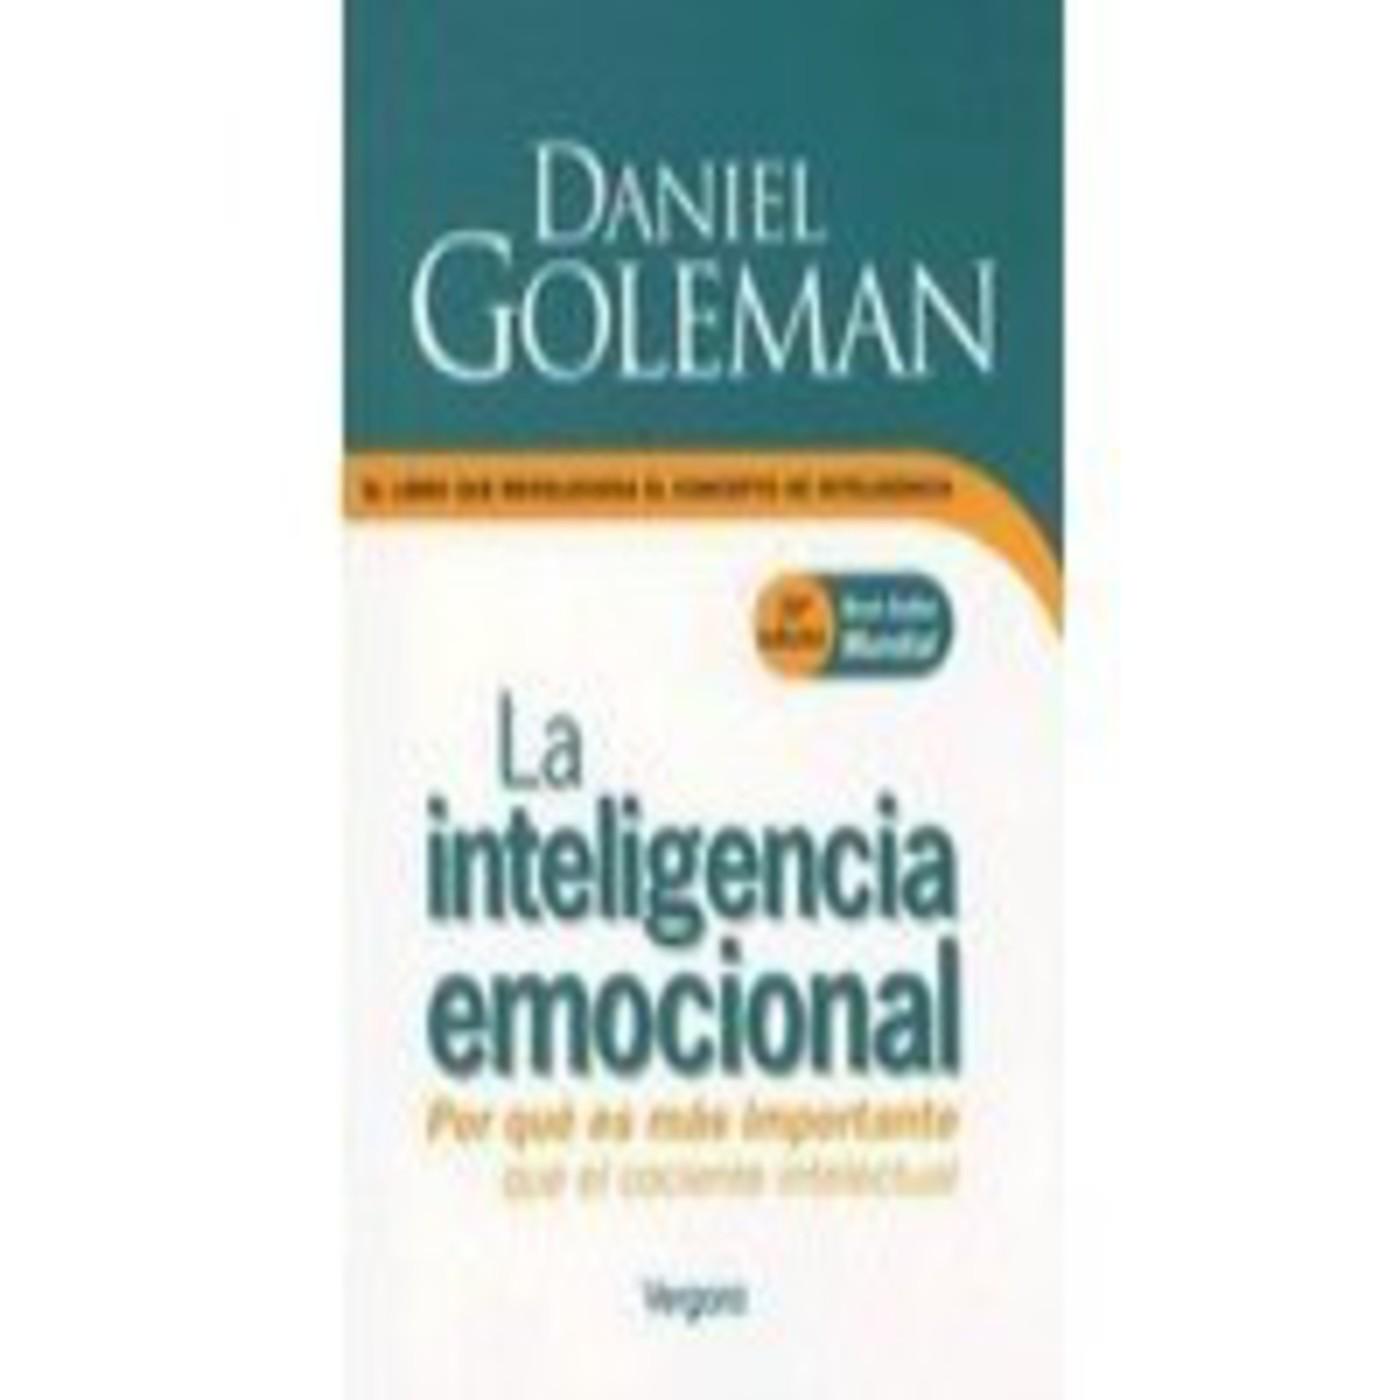 42..INTELIGENCIA EMOCIONAL, Daniel Goleman